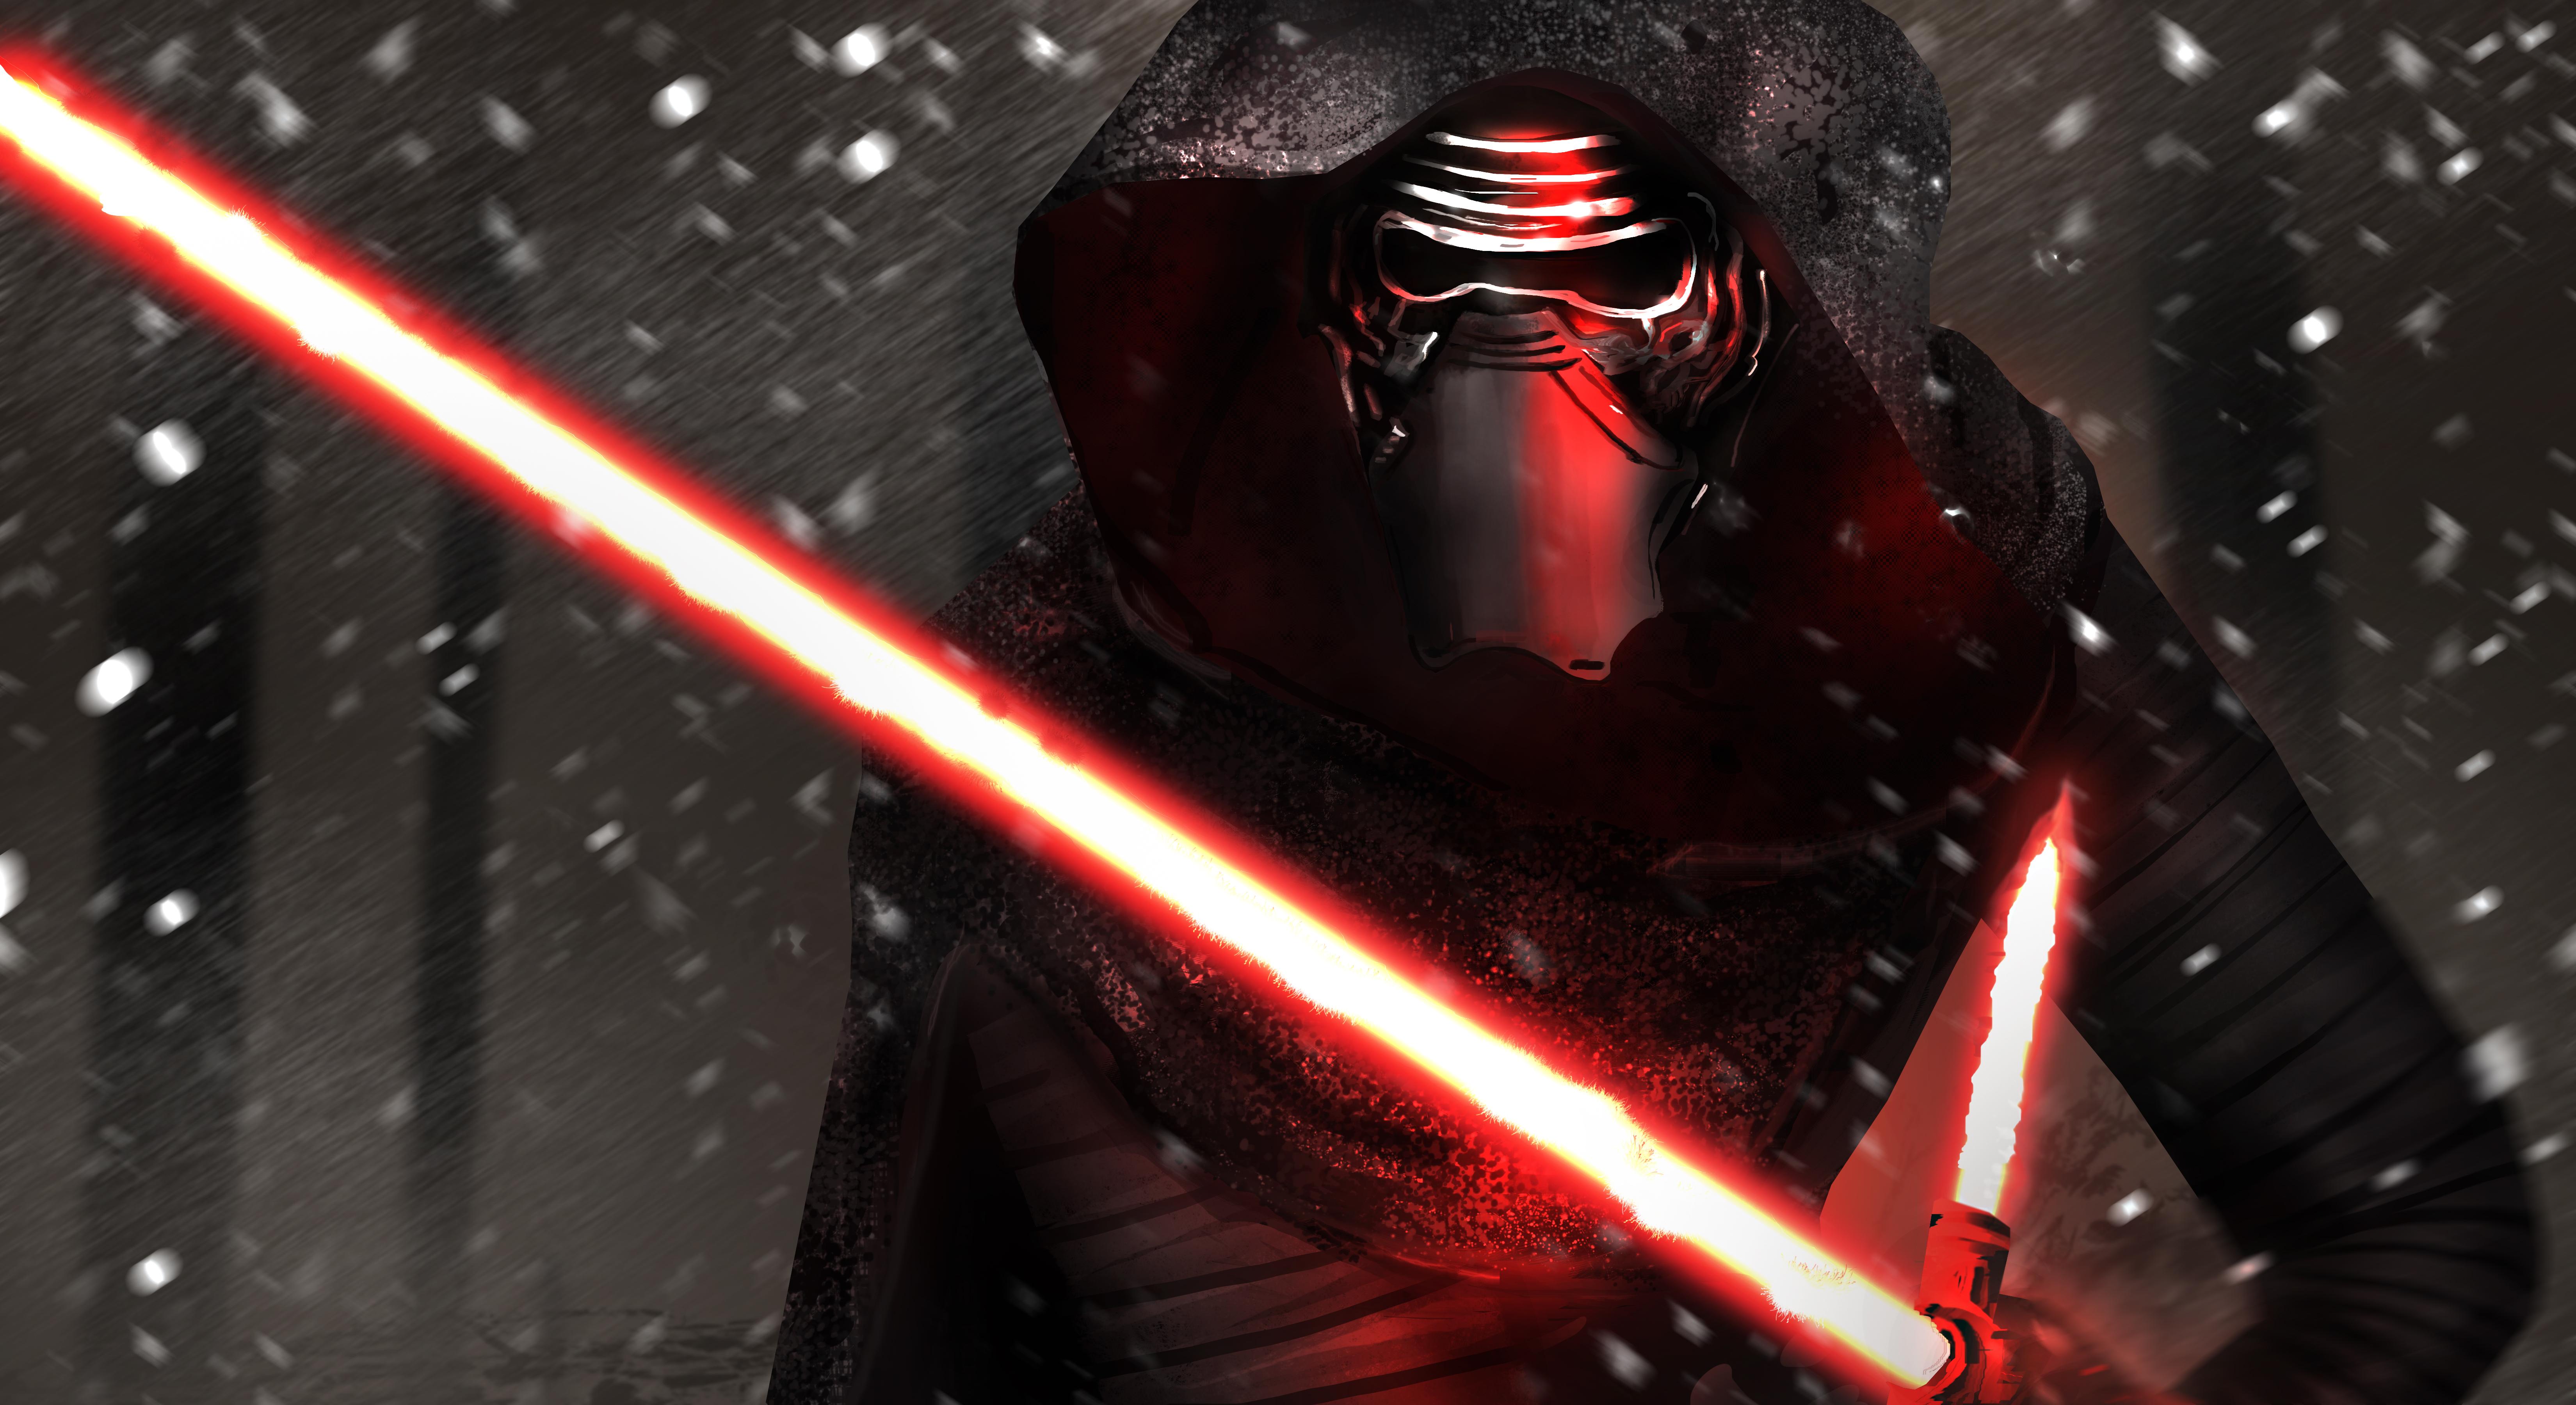 star wars episode vii the force awakens 5k retina ultra